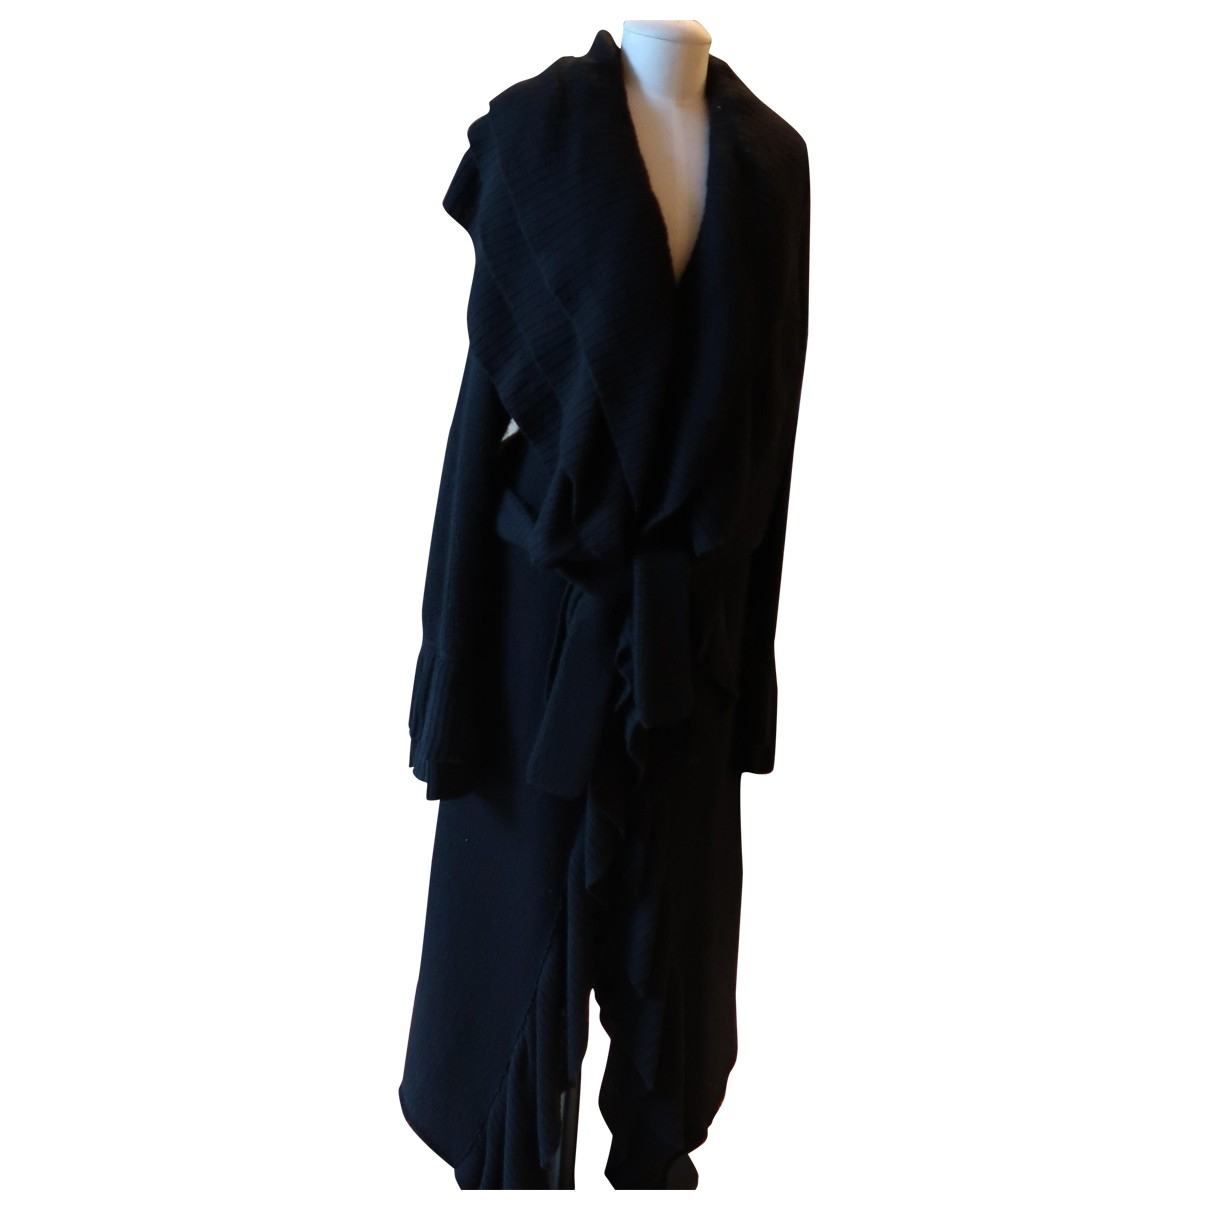 Emanuel Ungaro \N Black Wool coat for Women L International